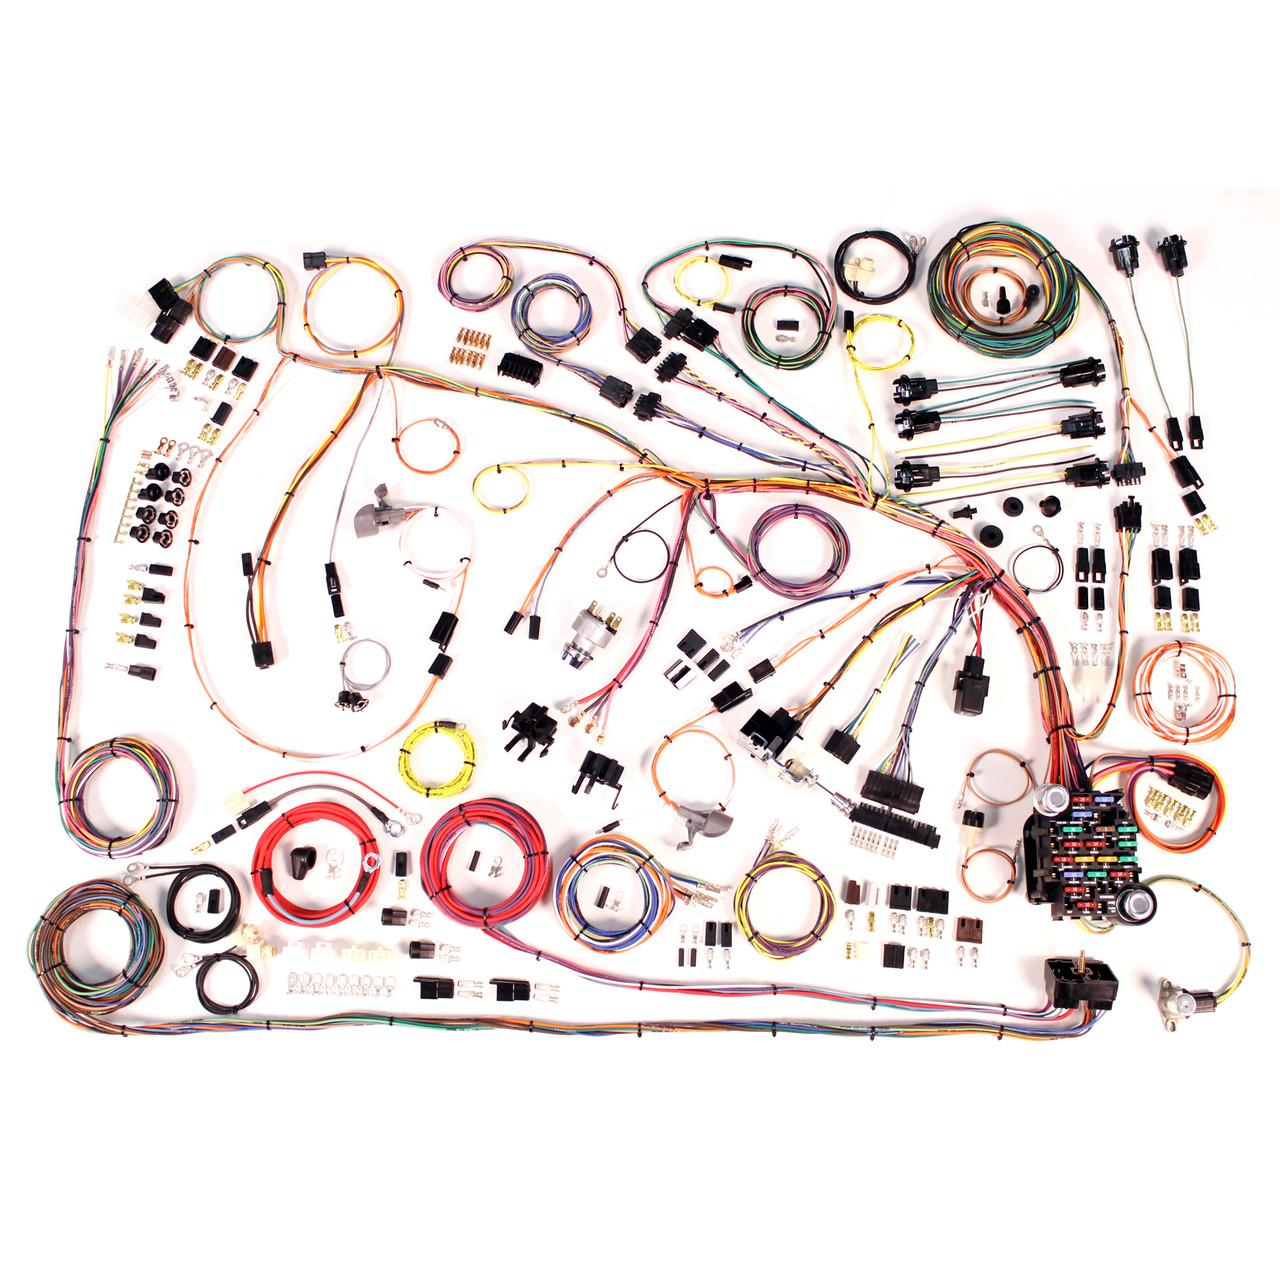 1968 impala fuse box diagram 66 impala fuse box 94m www praxis habernik de t  l  charger le  66 impala fuse box 94m www praxis